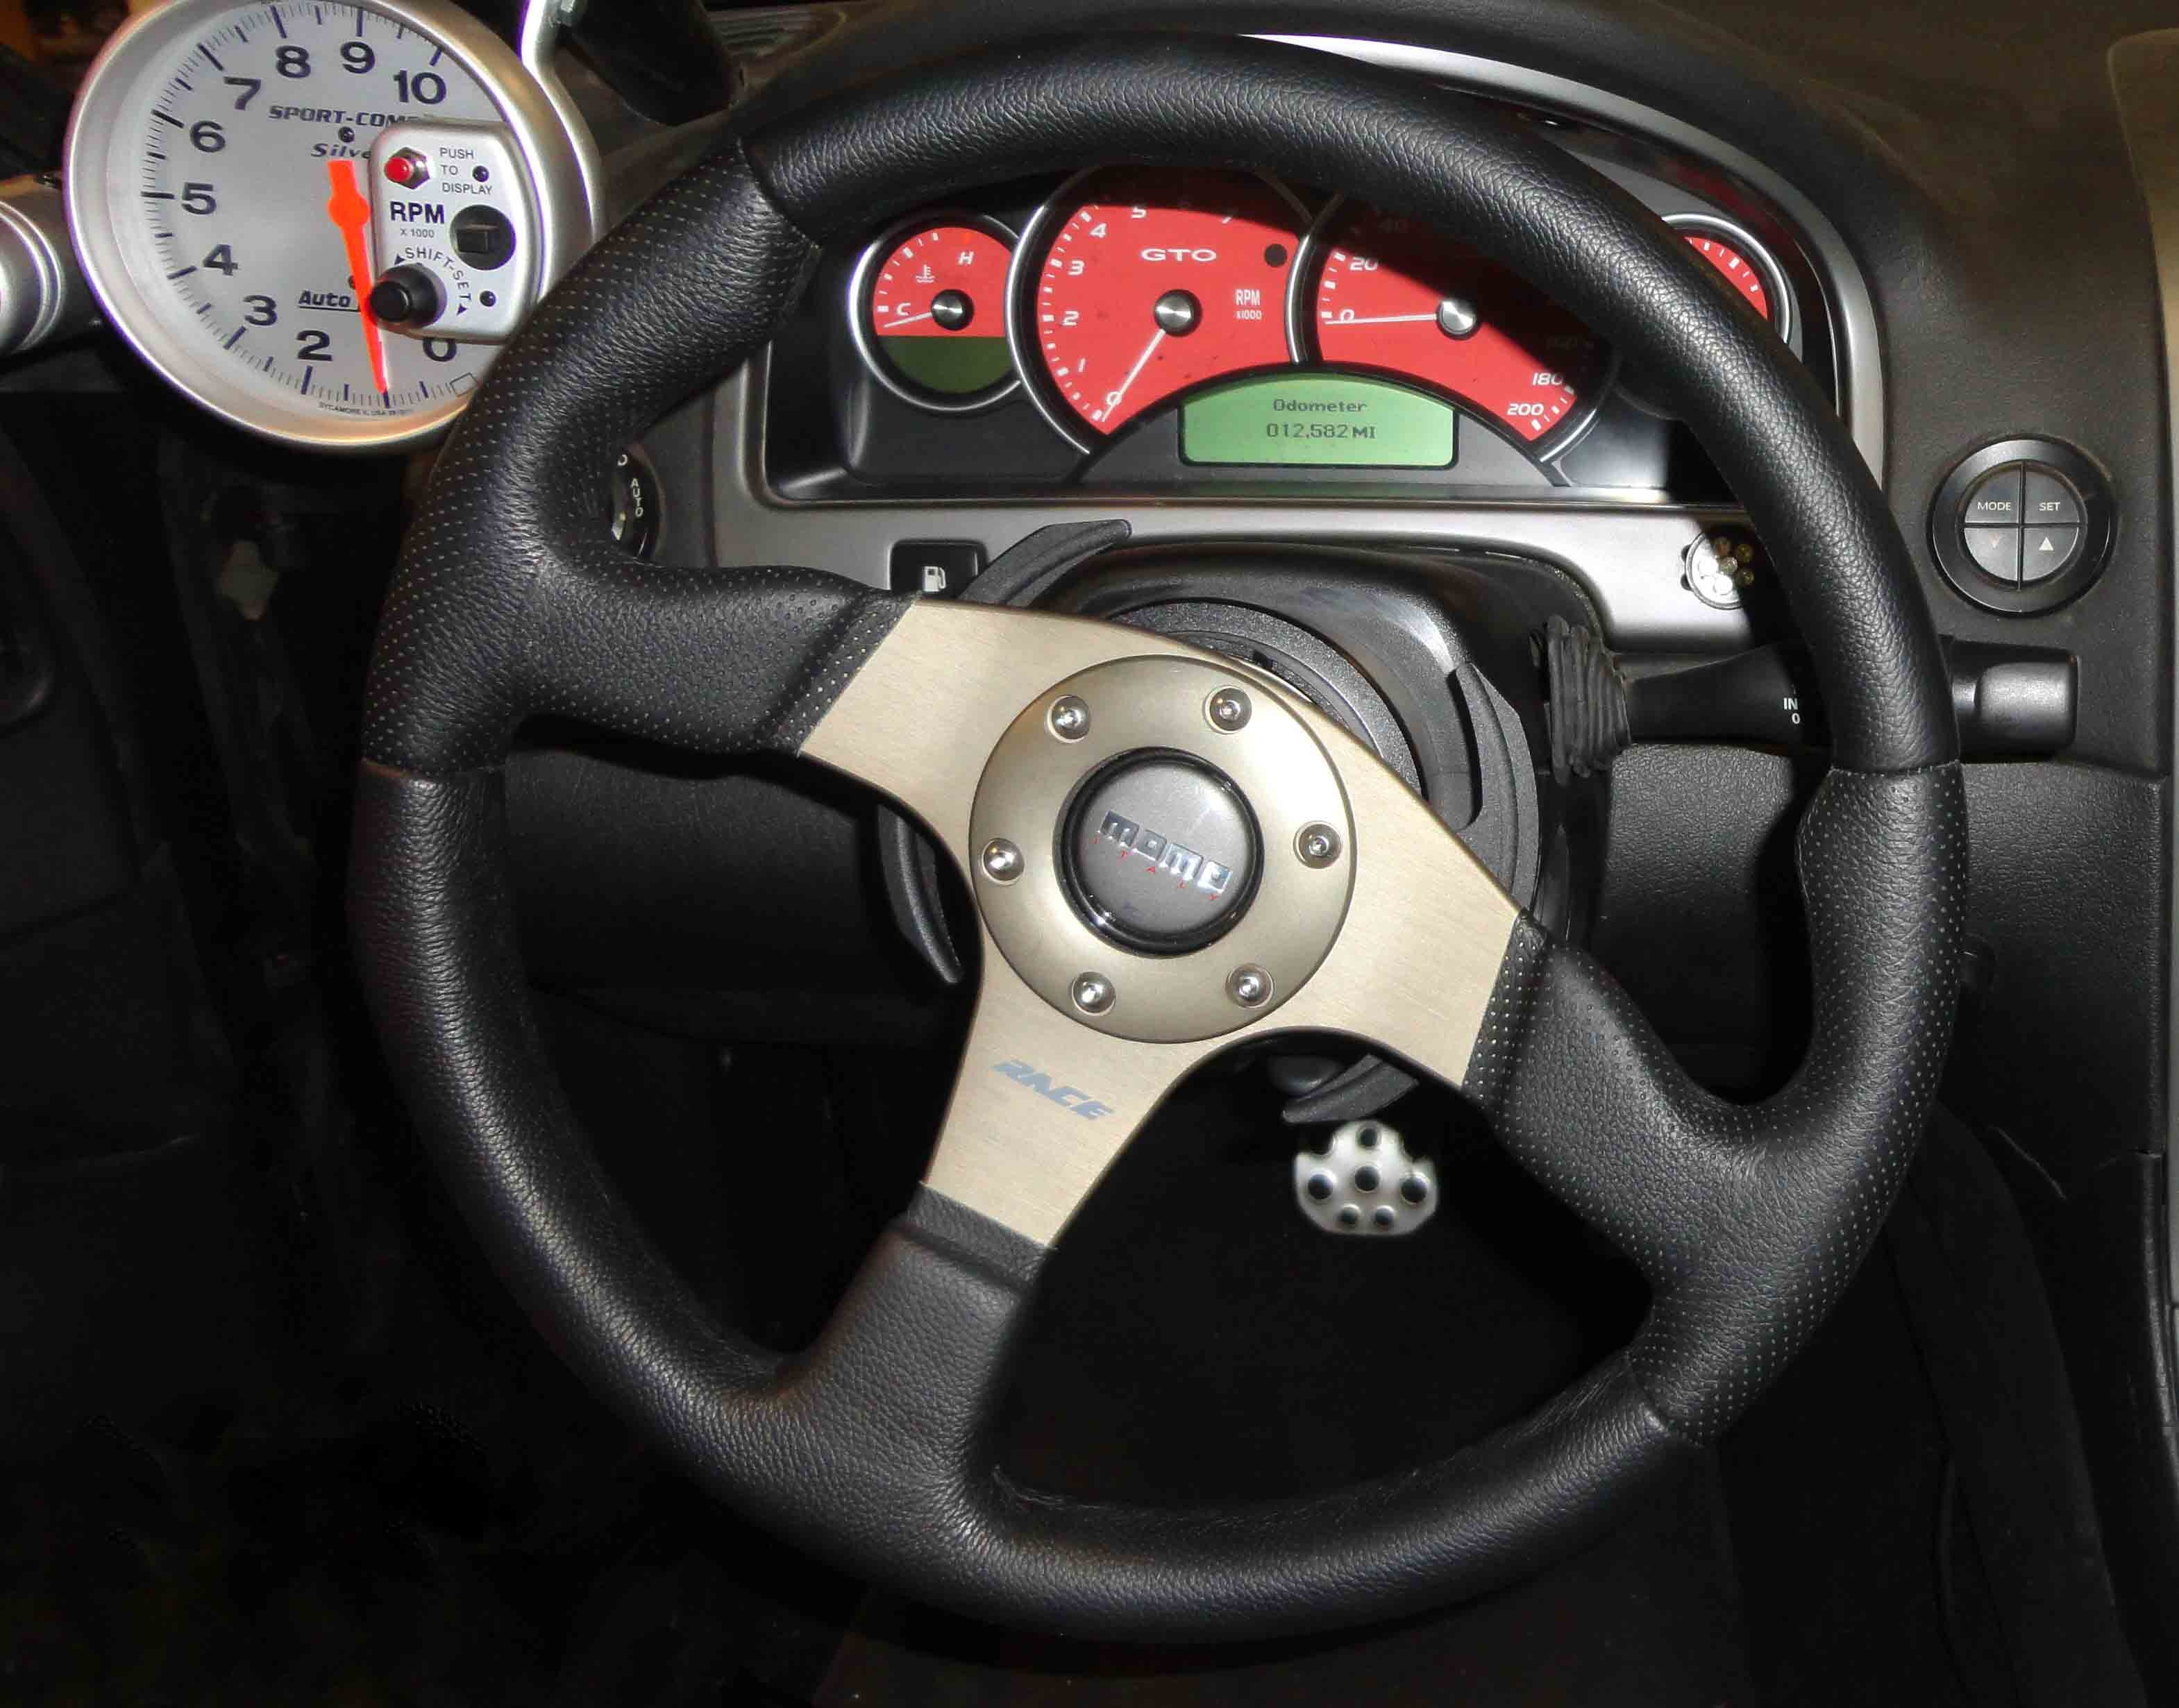 boss car stereo wiring harness adapters gto vz billet steering wheel adapter     gforce engineering  gto vz billet steering wheel adapter     gforce engineering